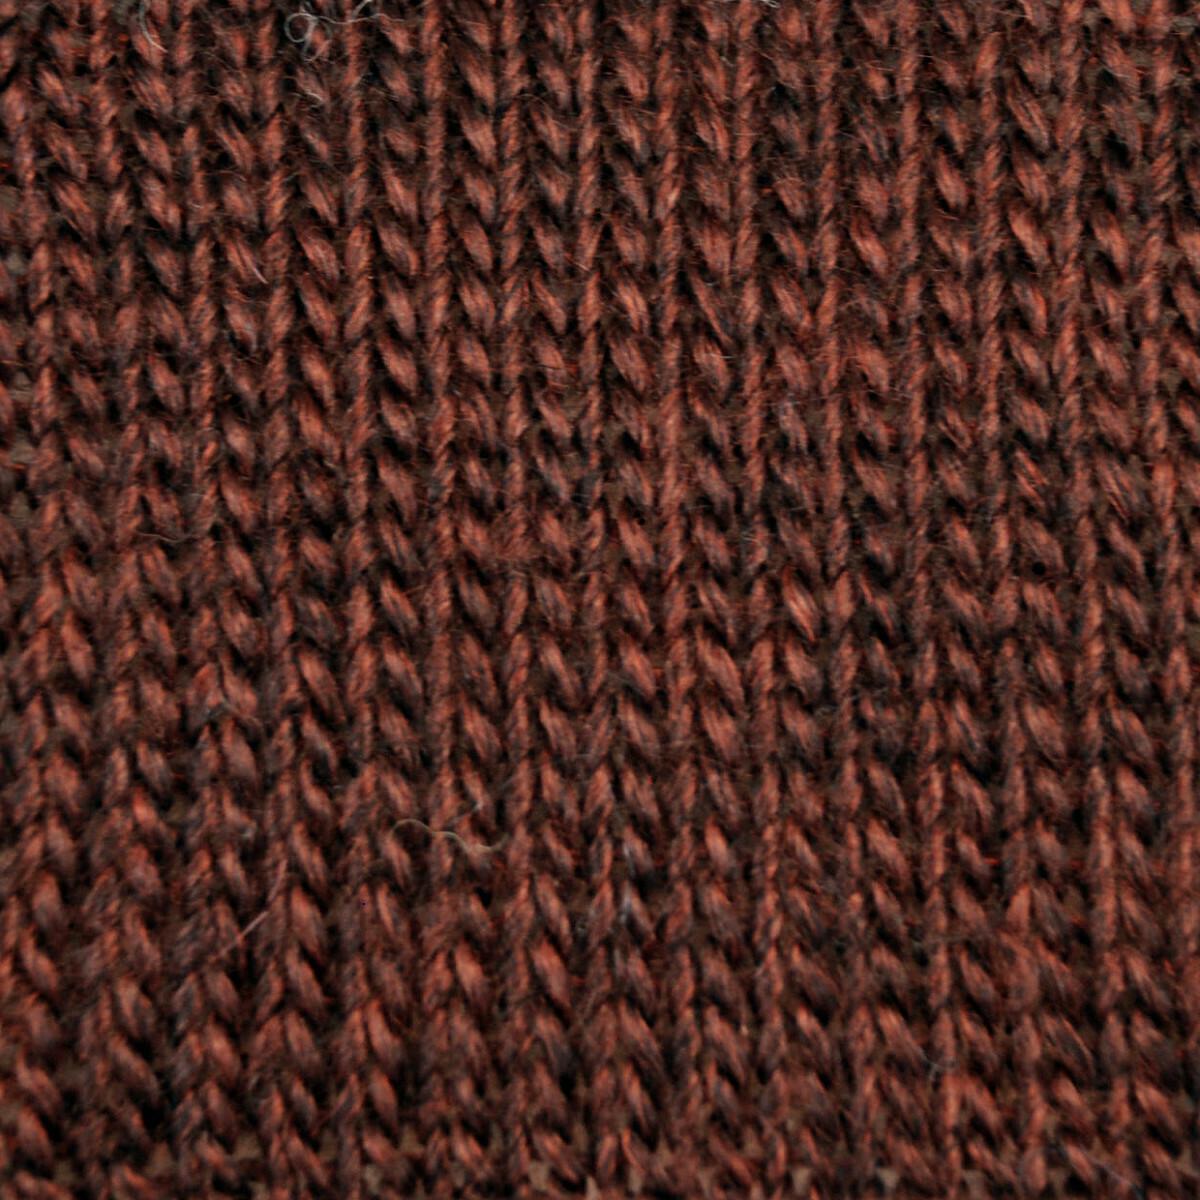 Astral Yarn - Copper Penny